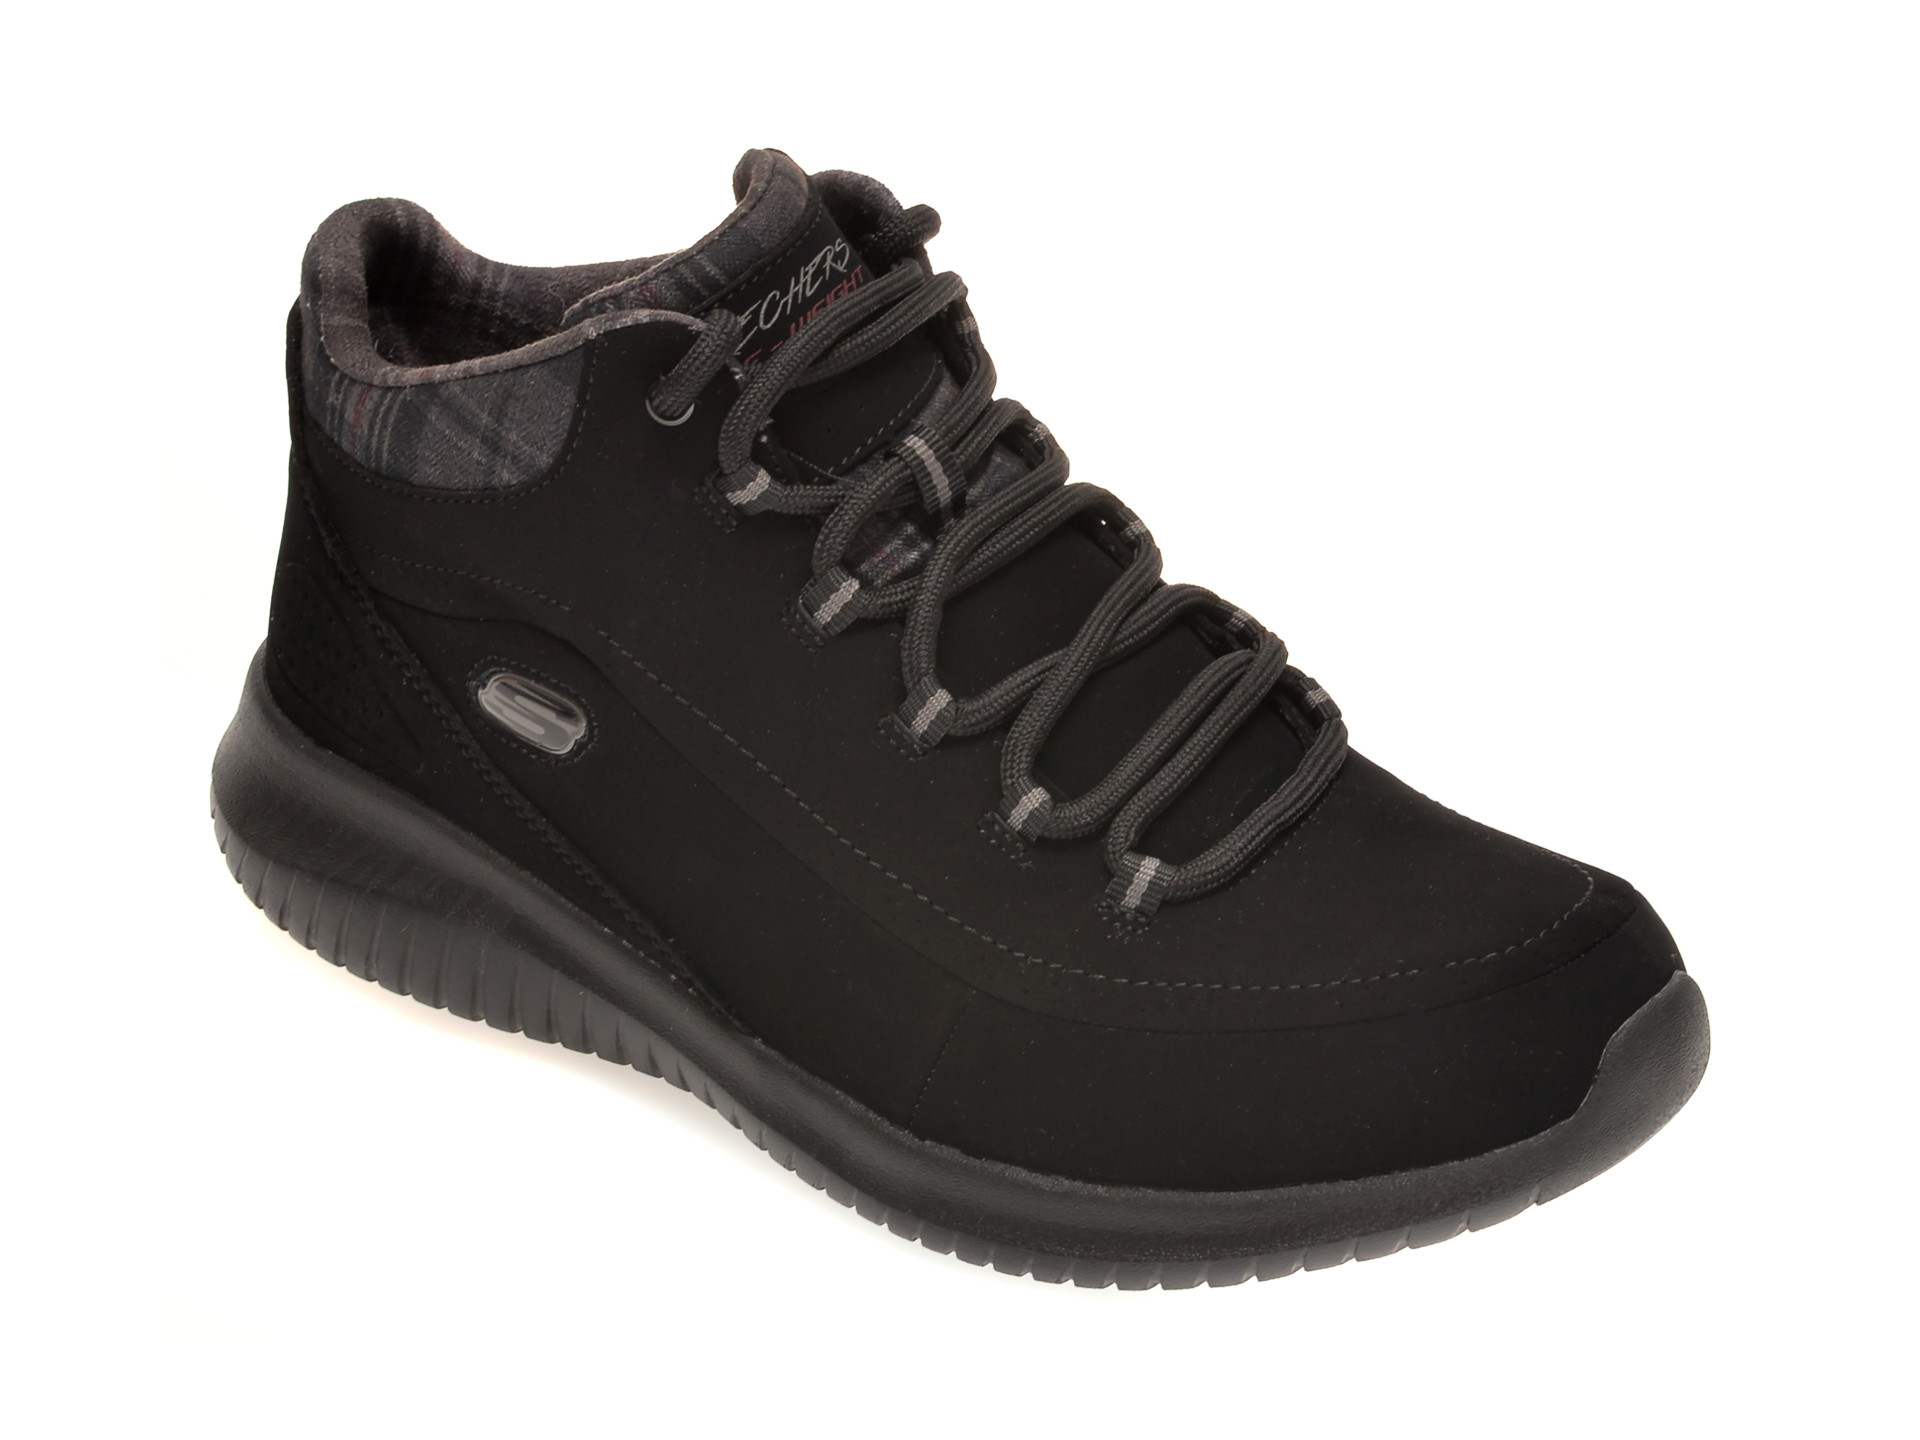 Pantofi SKECHERS negri, ULTRA FLEX JUST CHILL, din nabuc